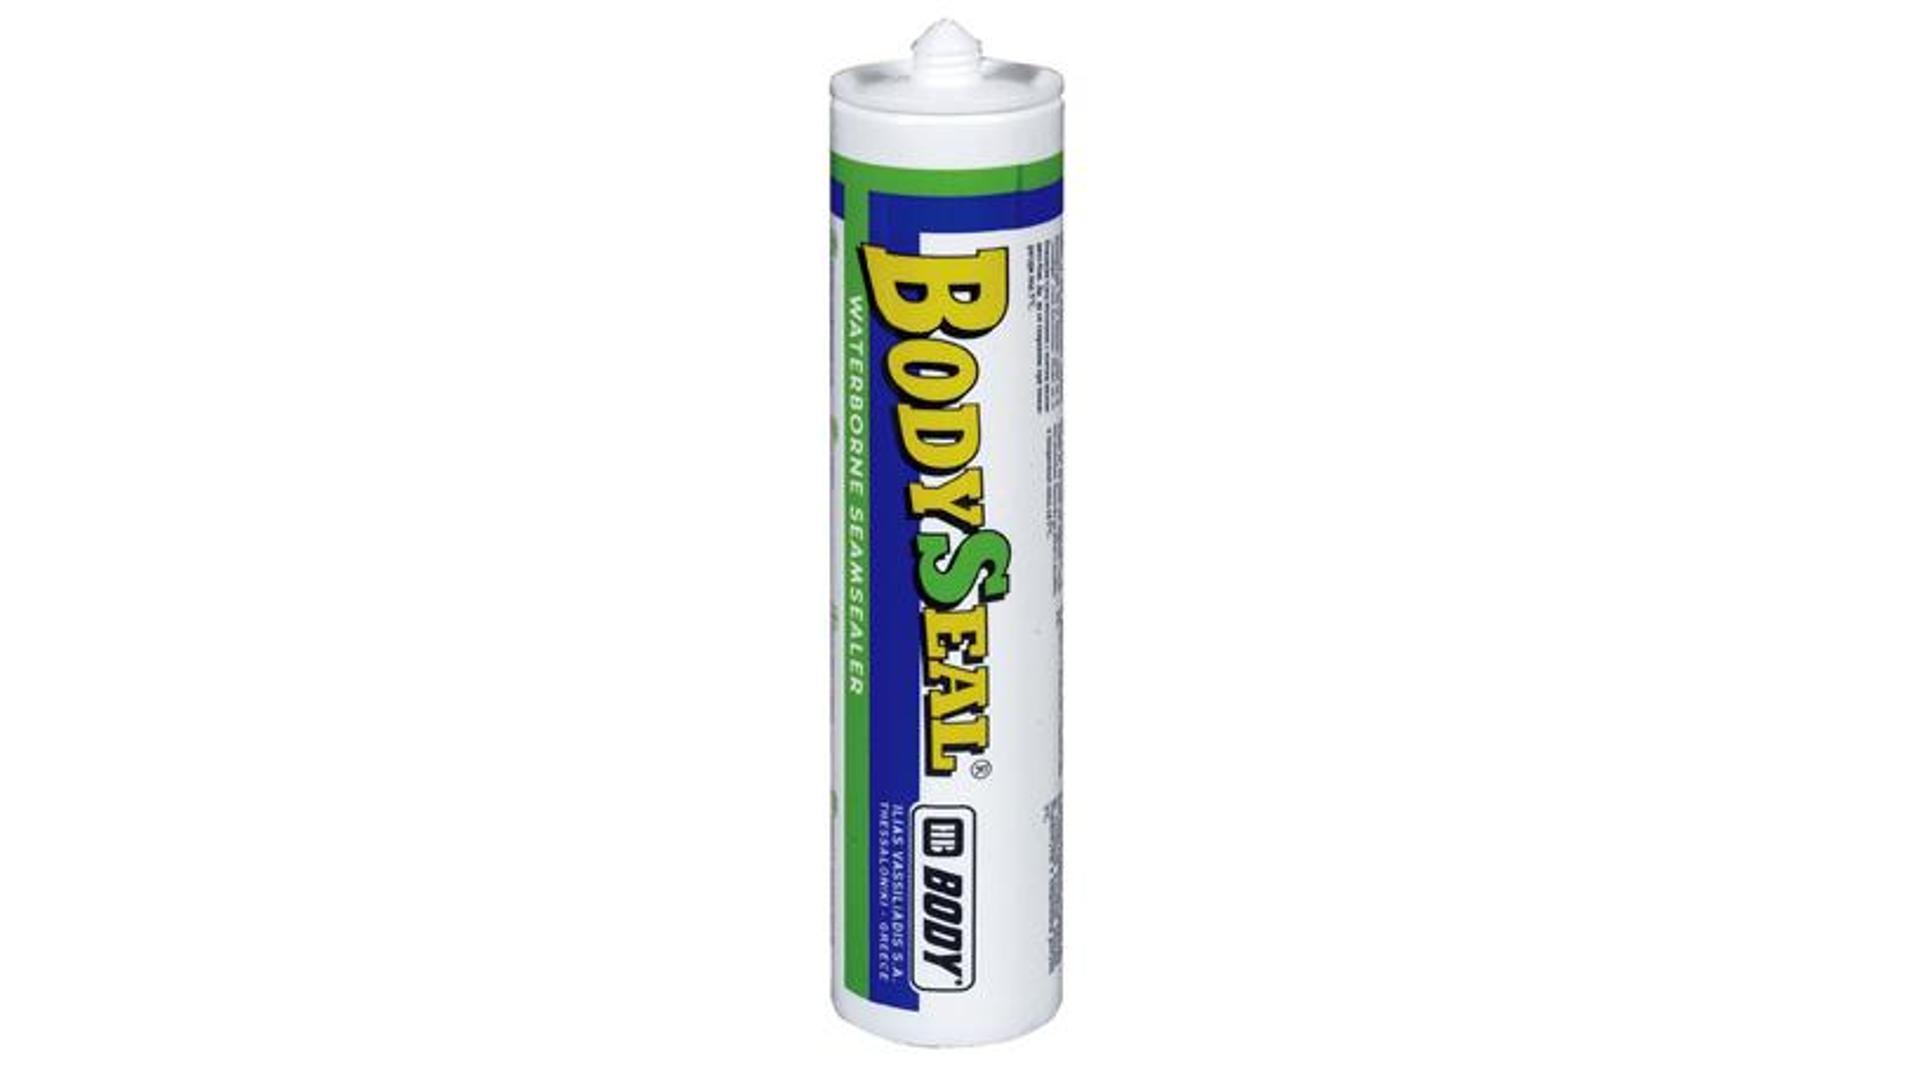 HB BODY SEAL 110 tuba těsnící tmel / hmota do interiéru i exteriéru 300ml